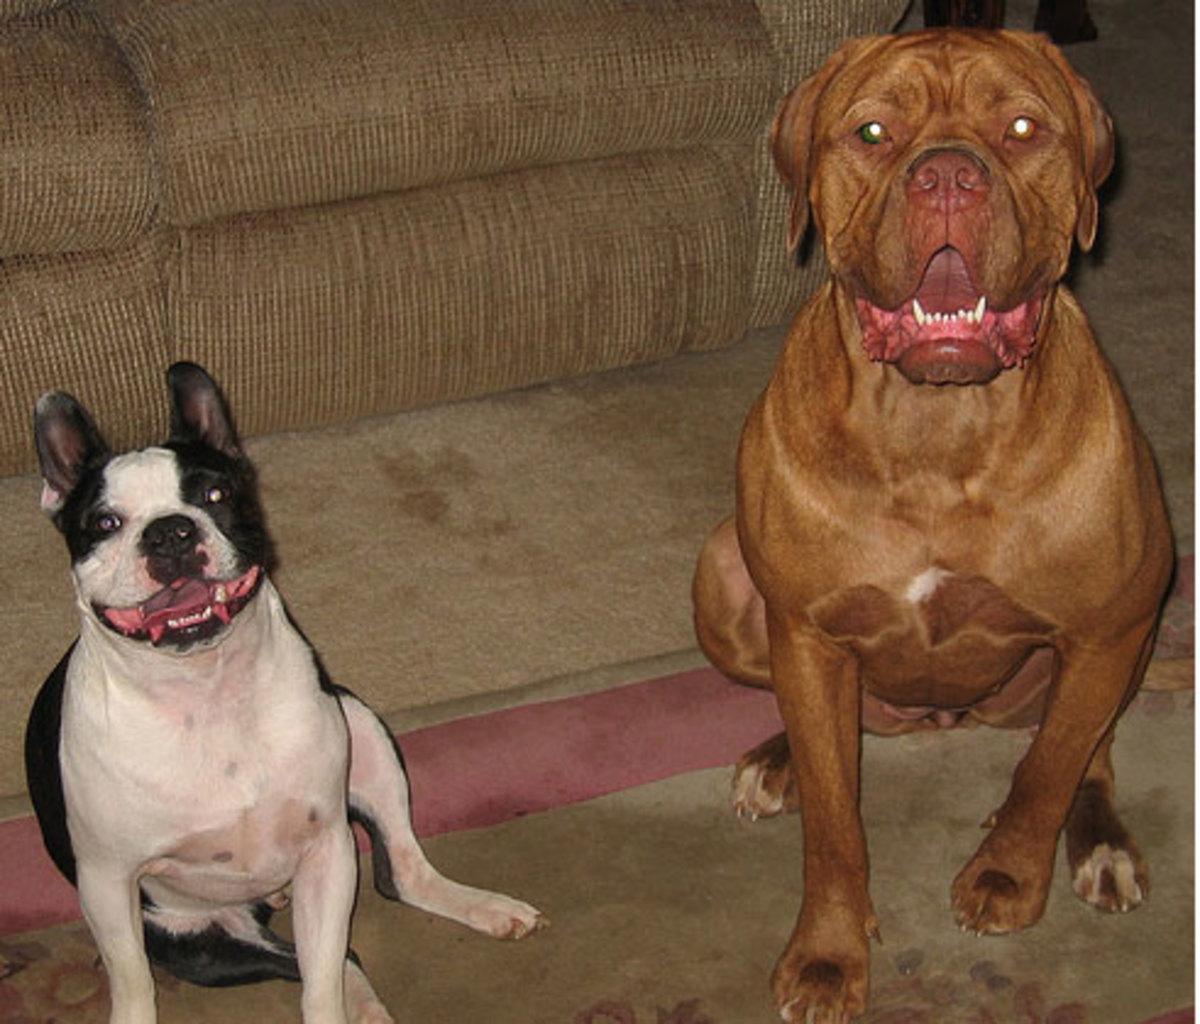 French Bulldog (left) and French Mastiff (right)